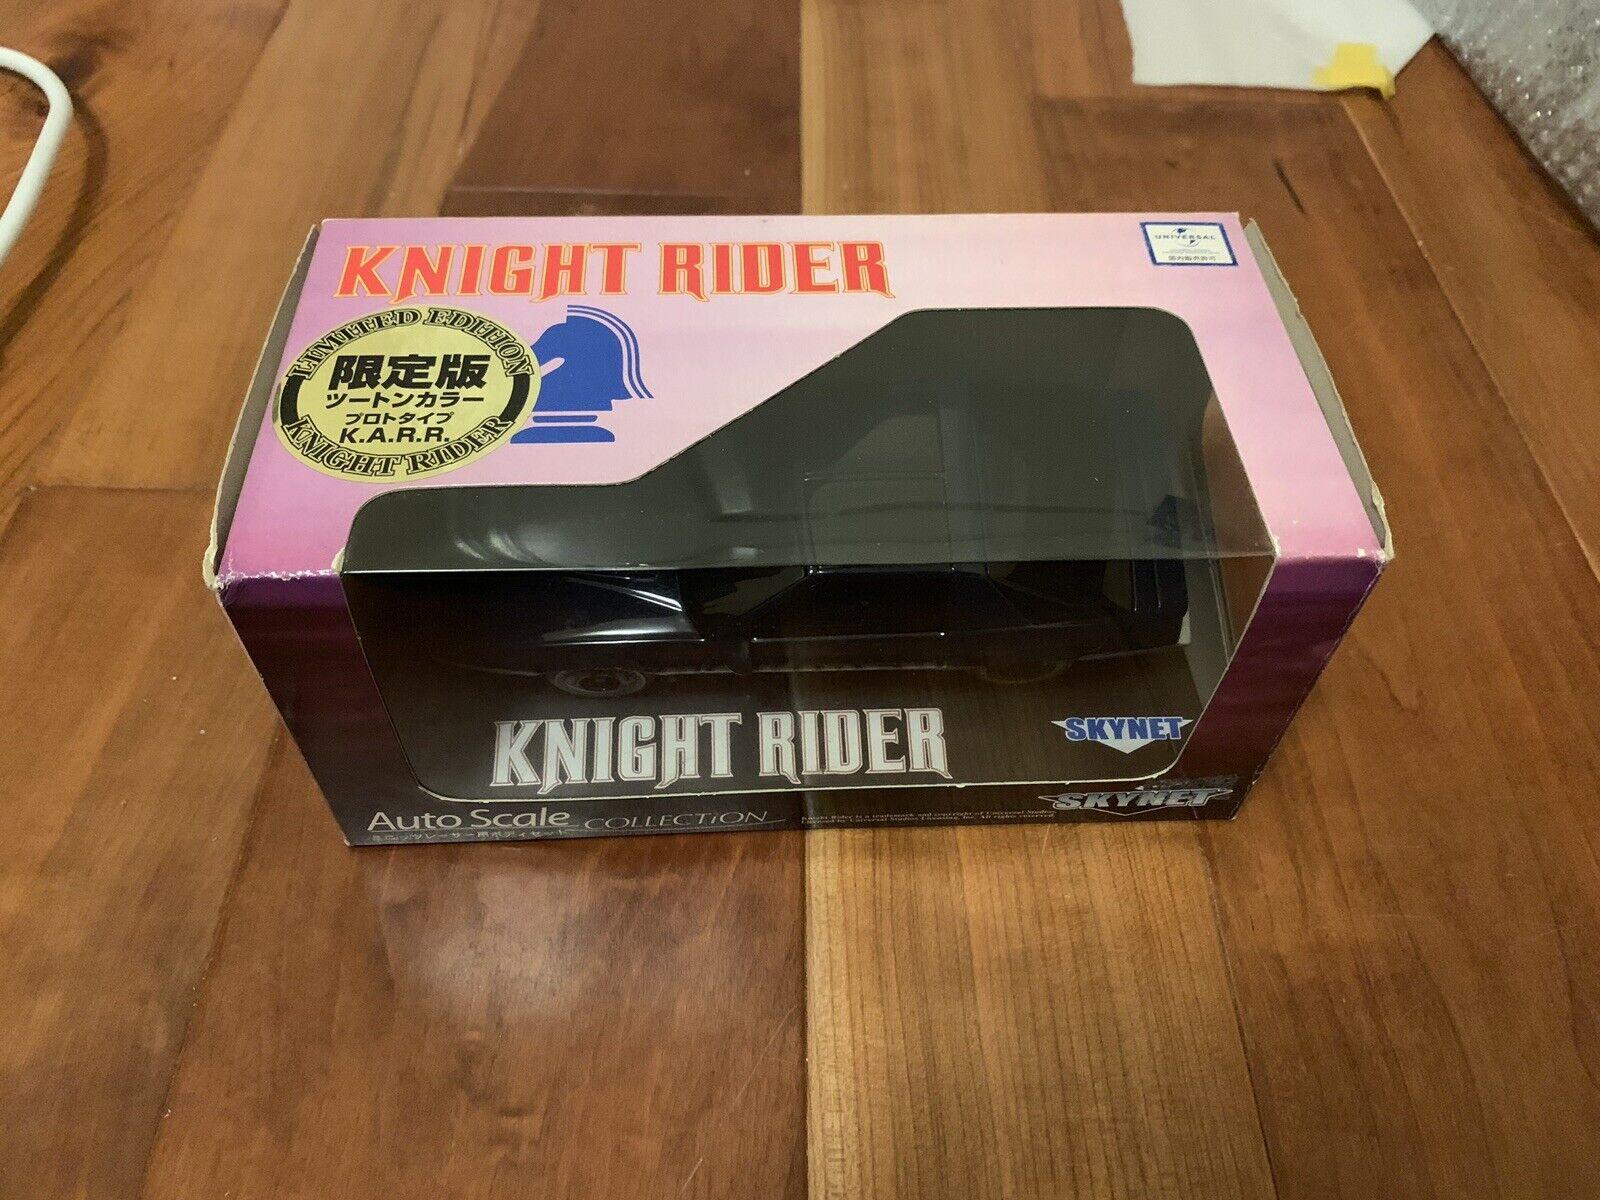 Kyosho Auto Scale Aoshima Mini-Z Knight Rider Prossootype  KARR Japan Exc. Ltd  consegna rapida